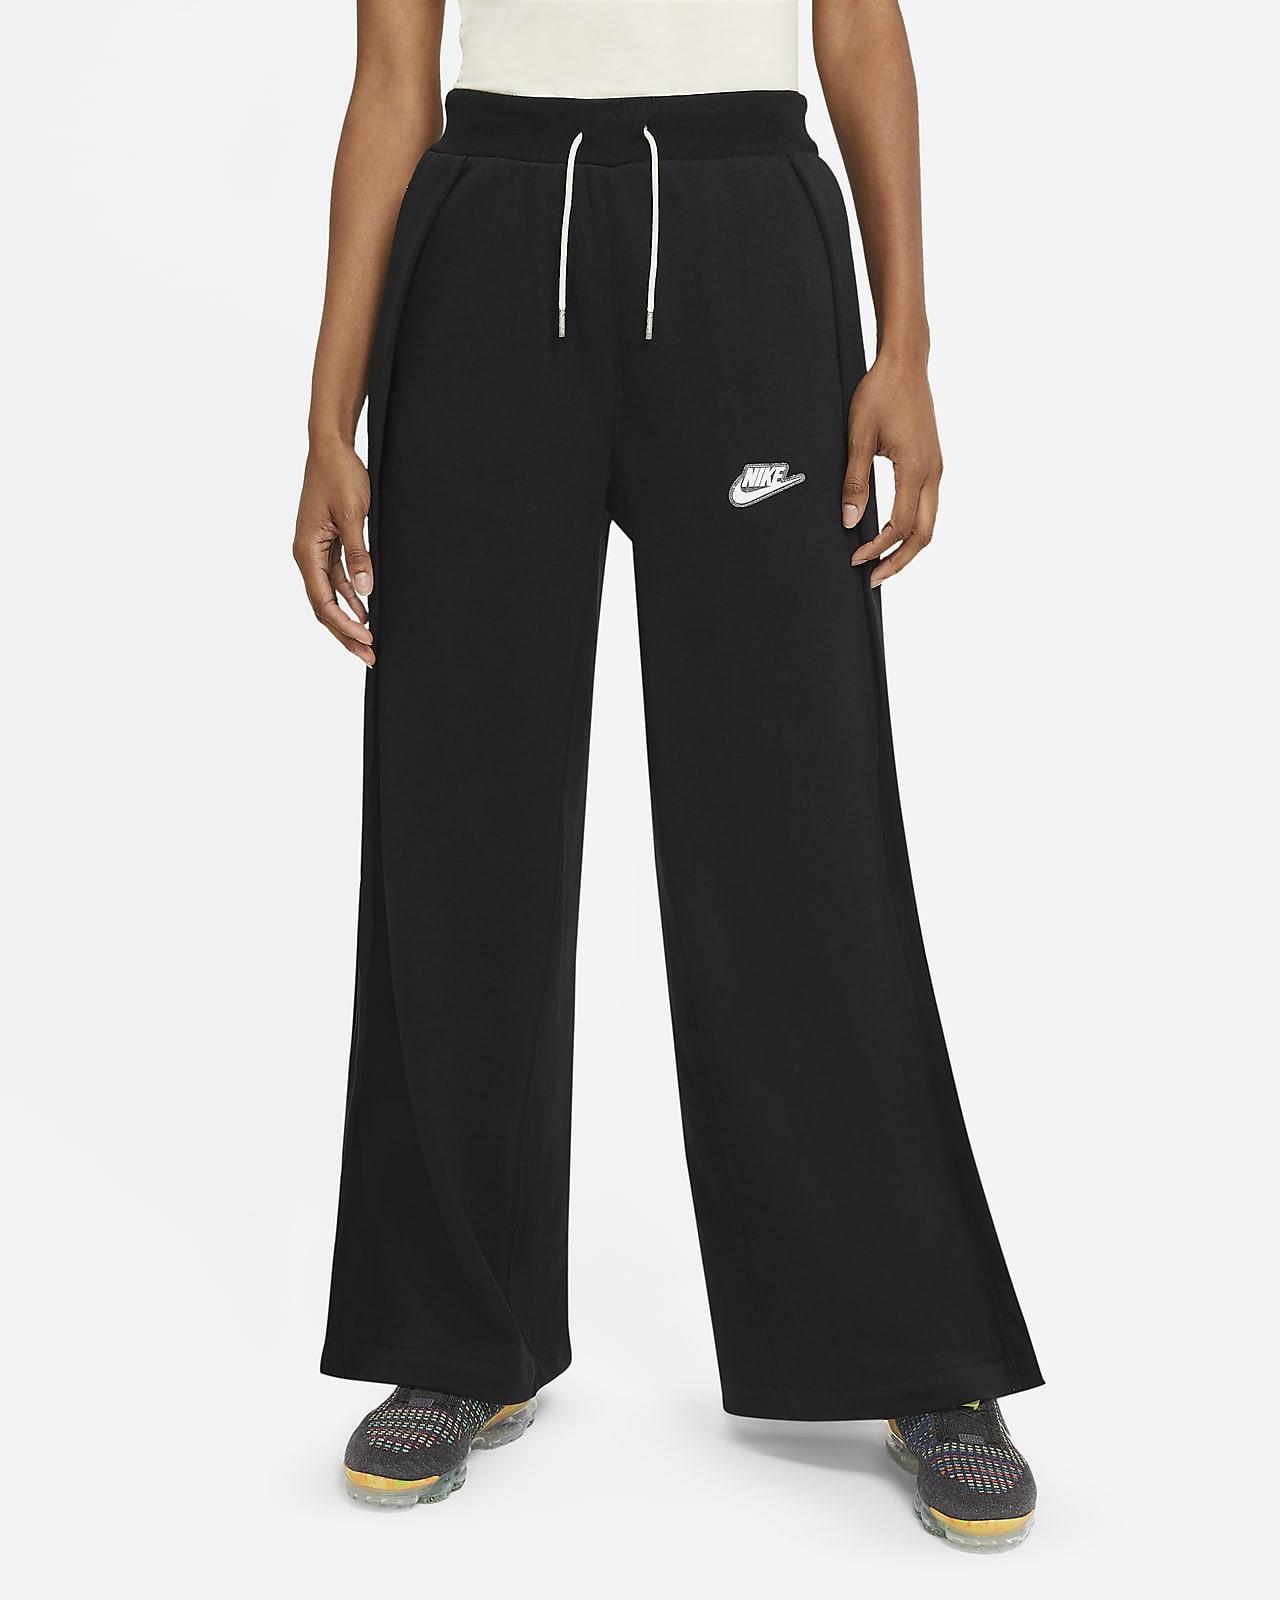 Nike Sportswear Pantalón de tejido French terry - Mujer